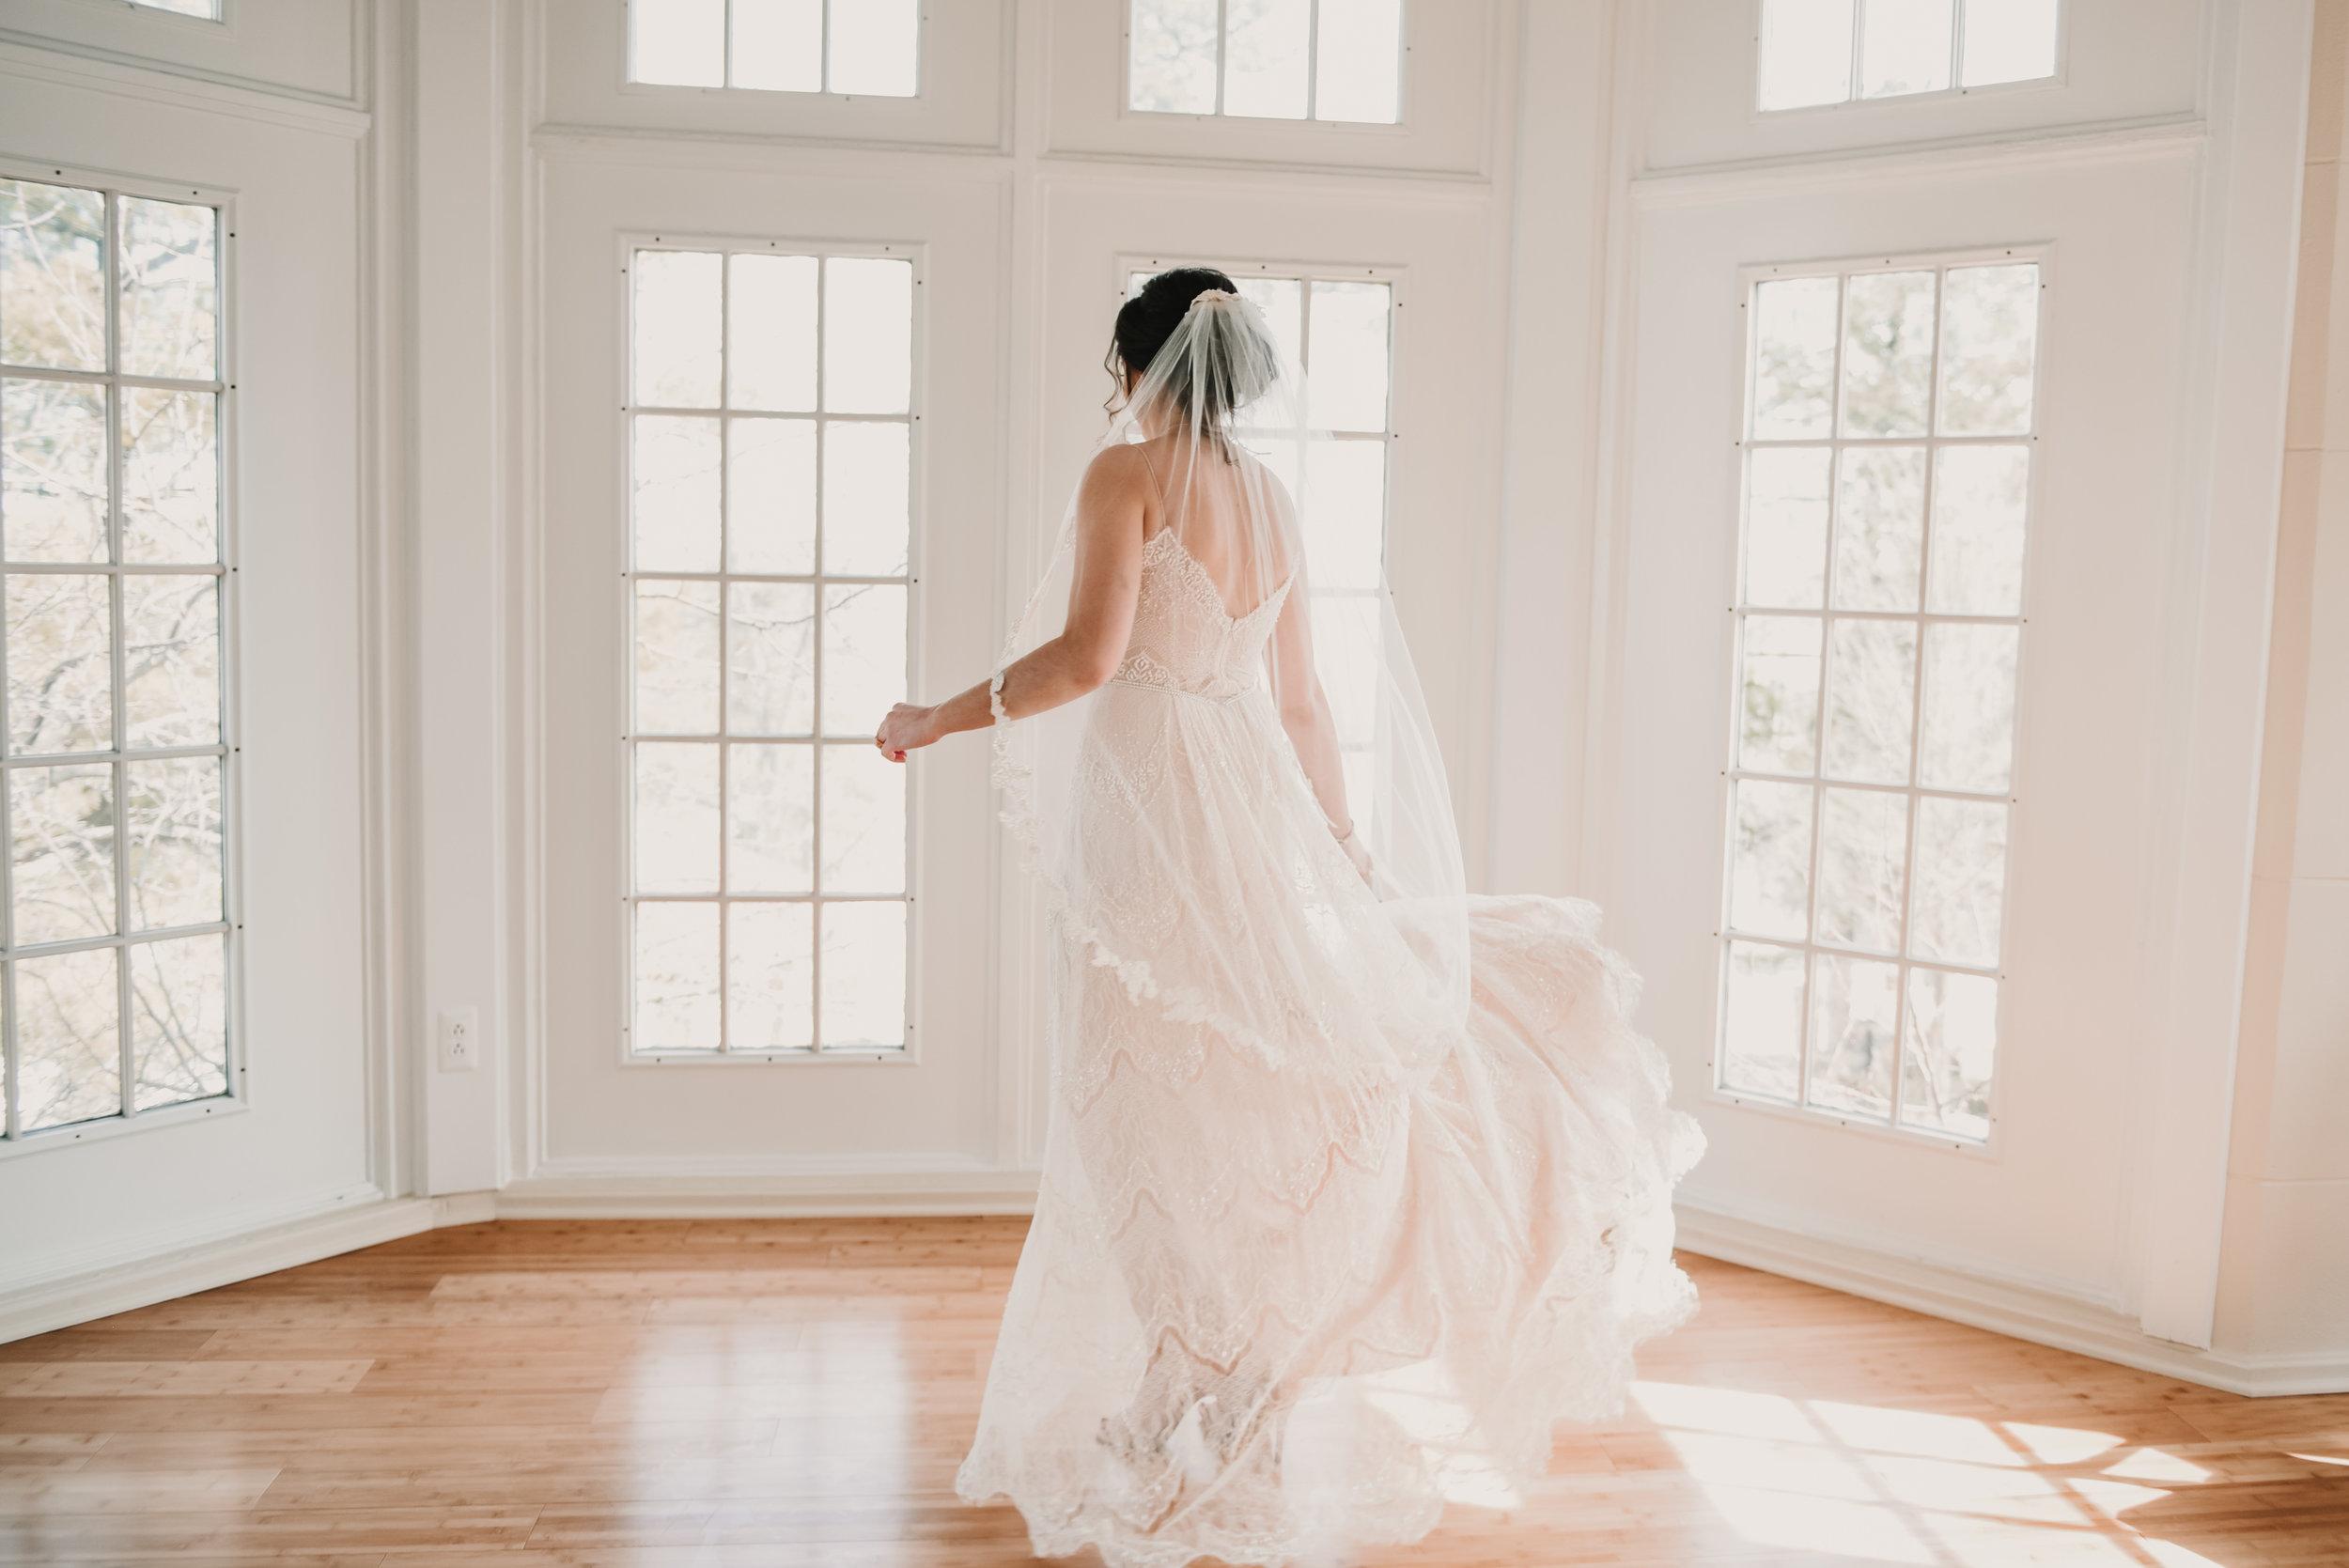 Bride dancing in her wedding dress by the window